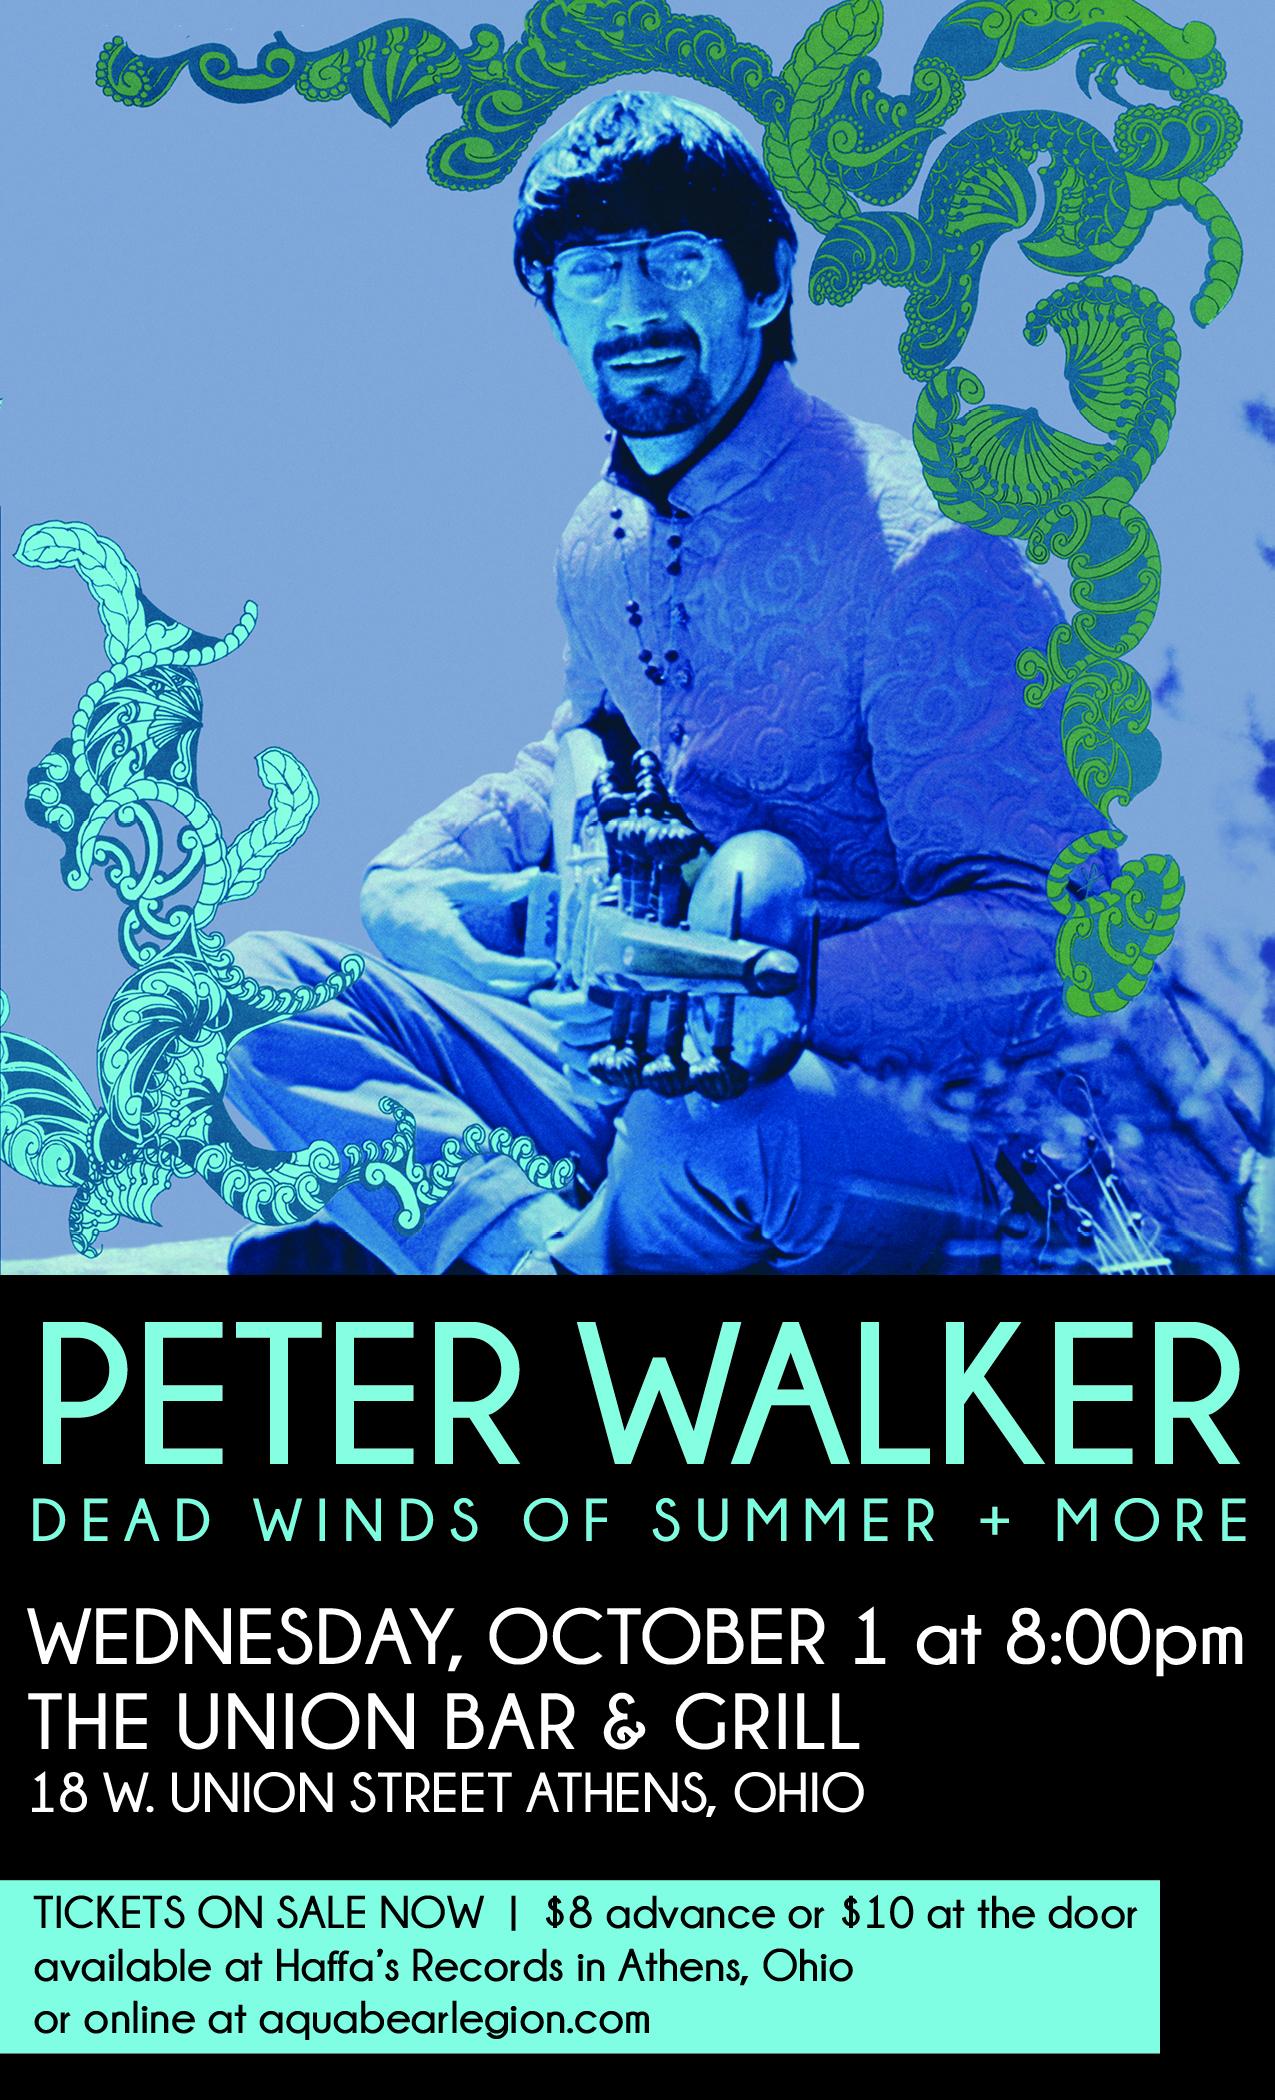 PeterWalker2014